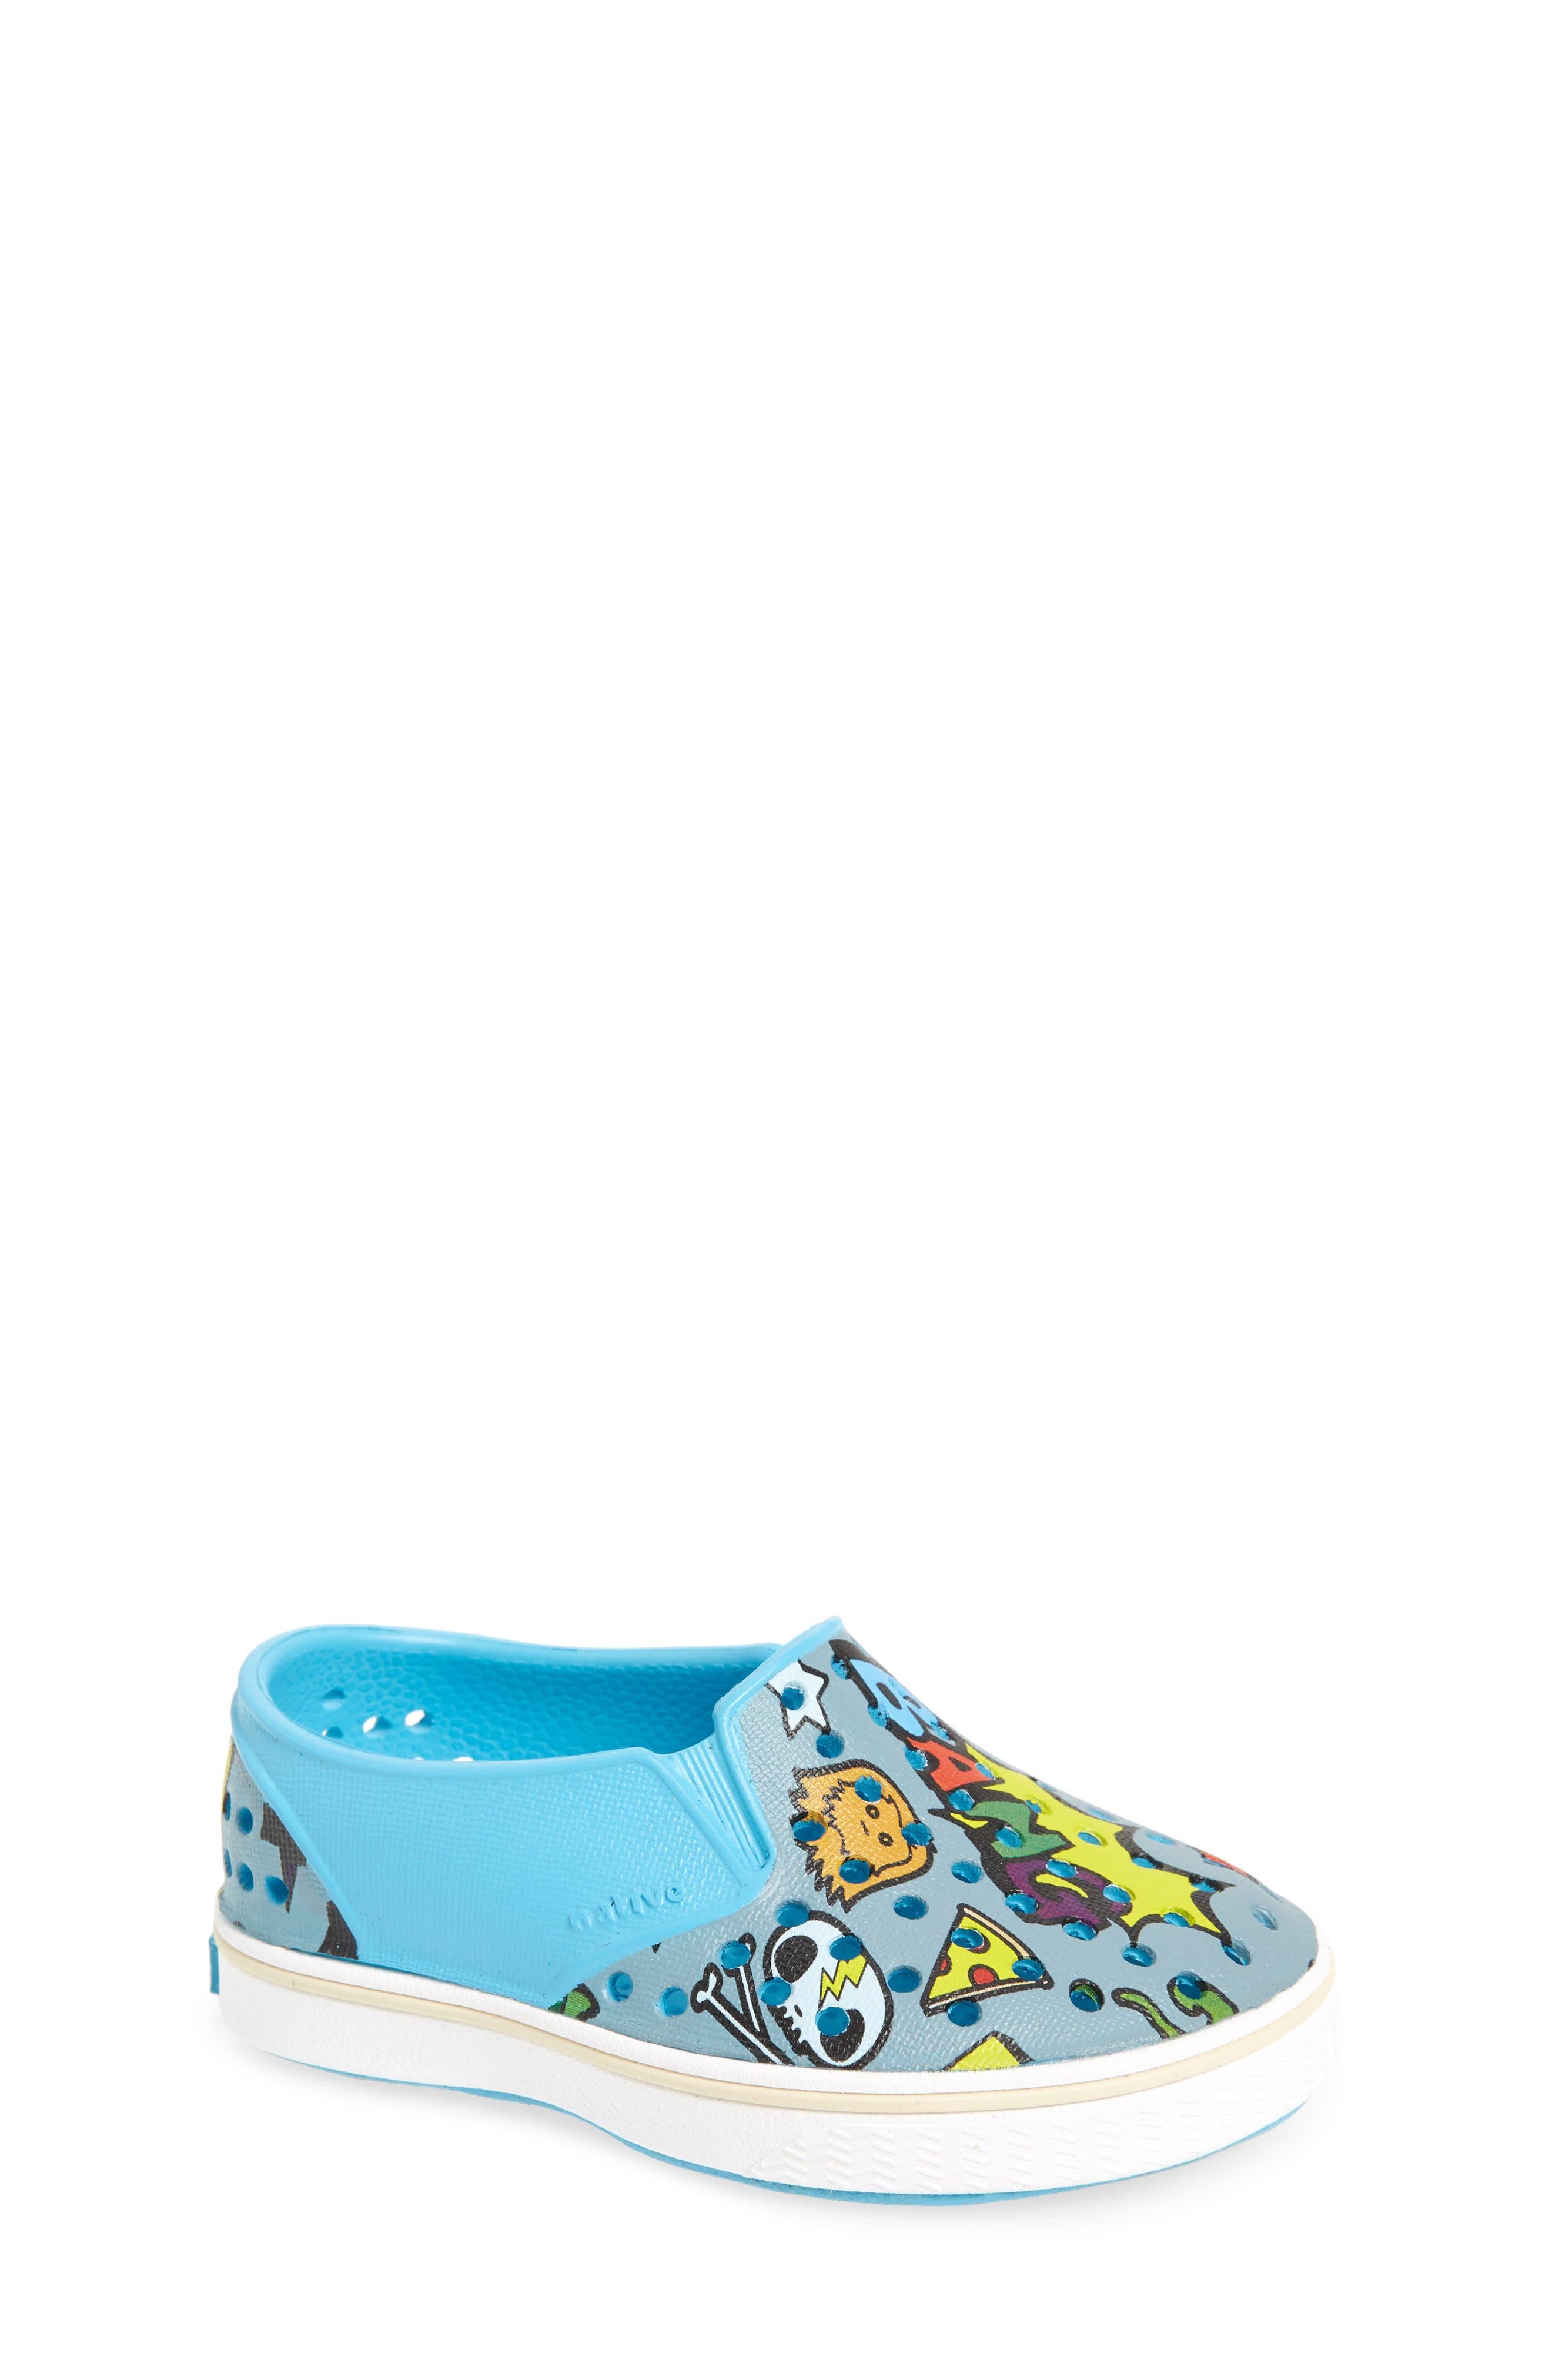 Main Image - Native Shoes Miles Print Slip-On Sneaker (Baby, Walker, Toddler, Little Kid & Big Kid)